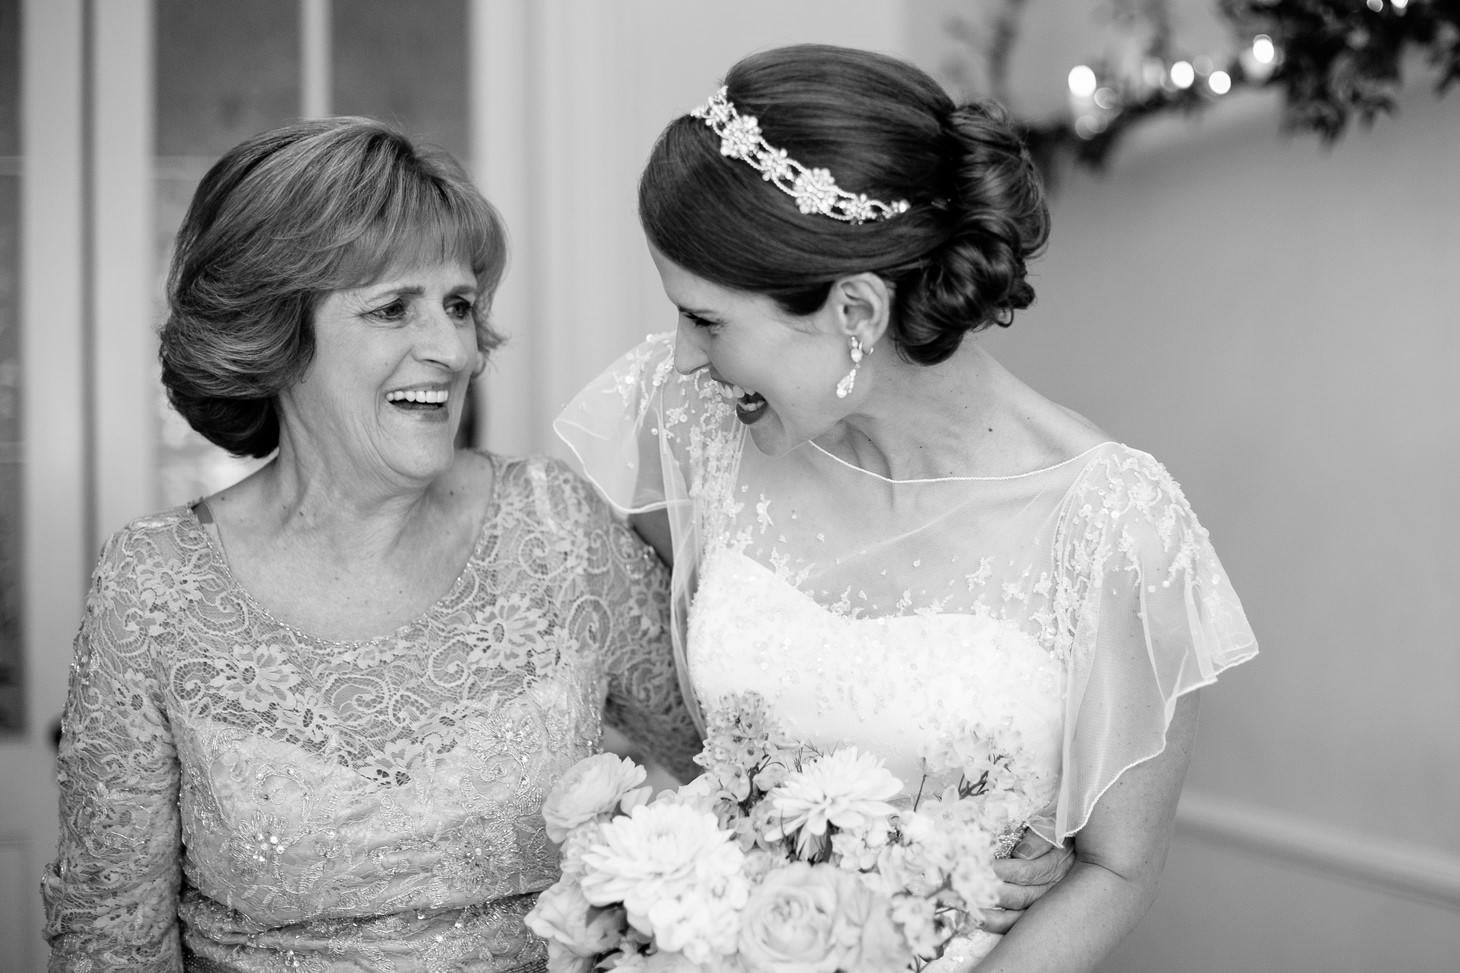 brooklyn-wedding-photographer-smitten-chickens-14.jpg